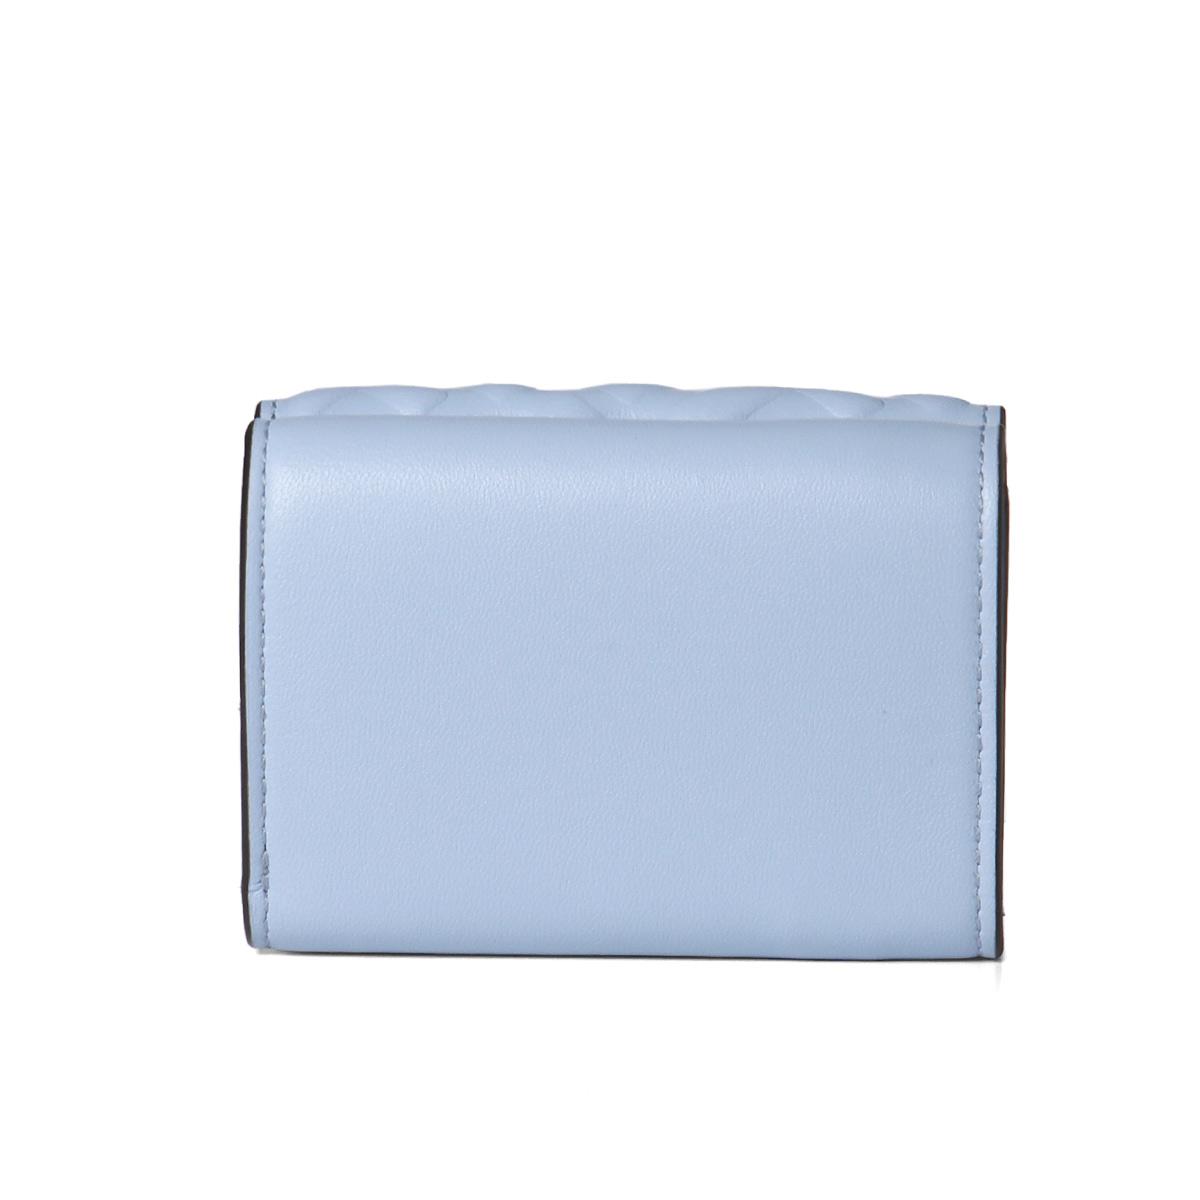 FENDI フェンディ   三つ折り財布 マイクロ